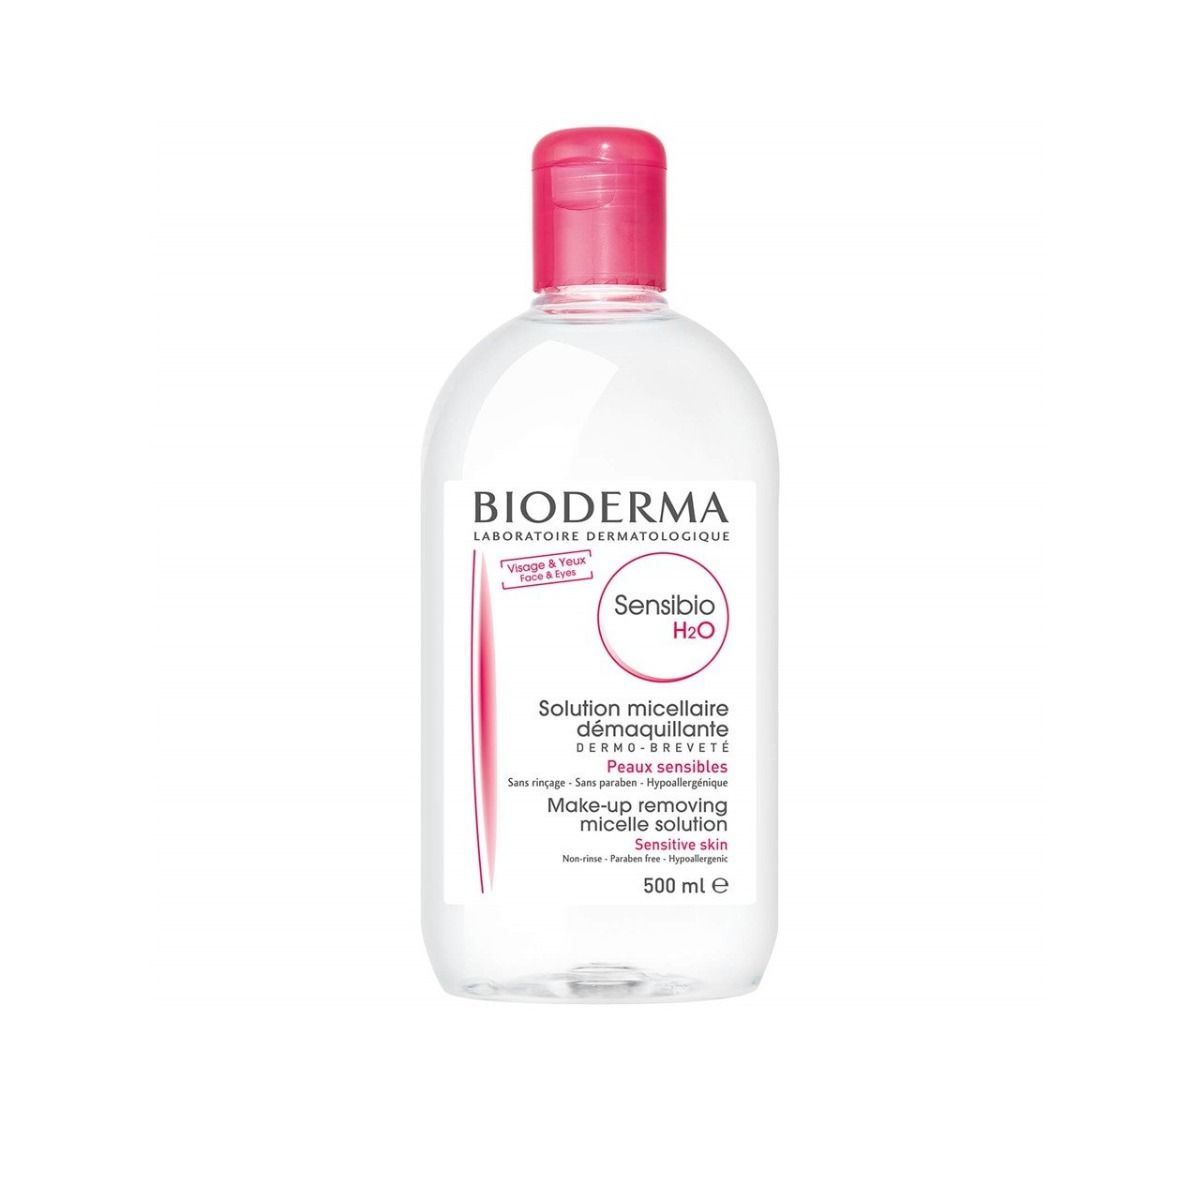 Bioderma Sensibio H2O Micelle Solution 500ml